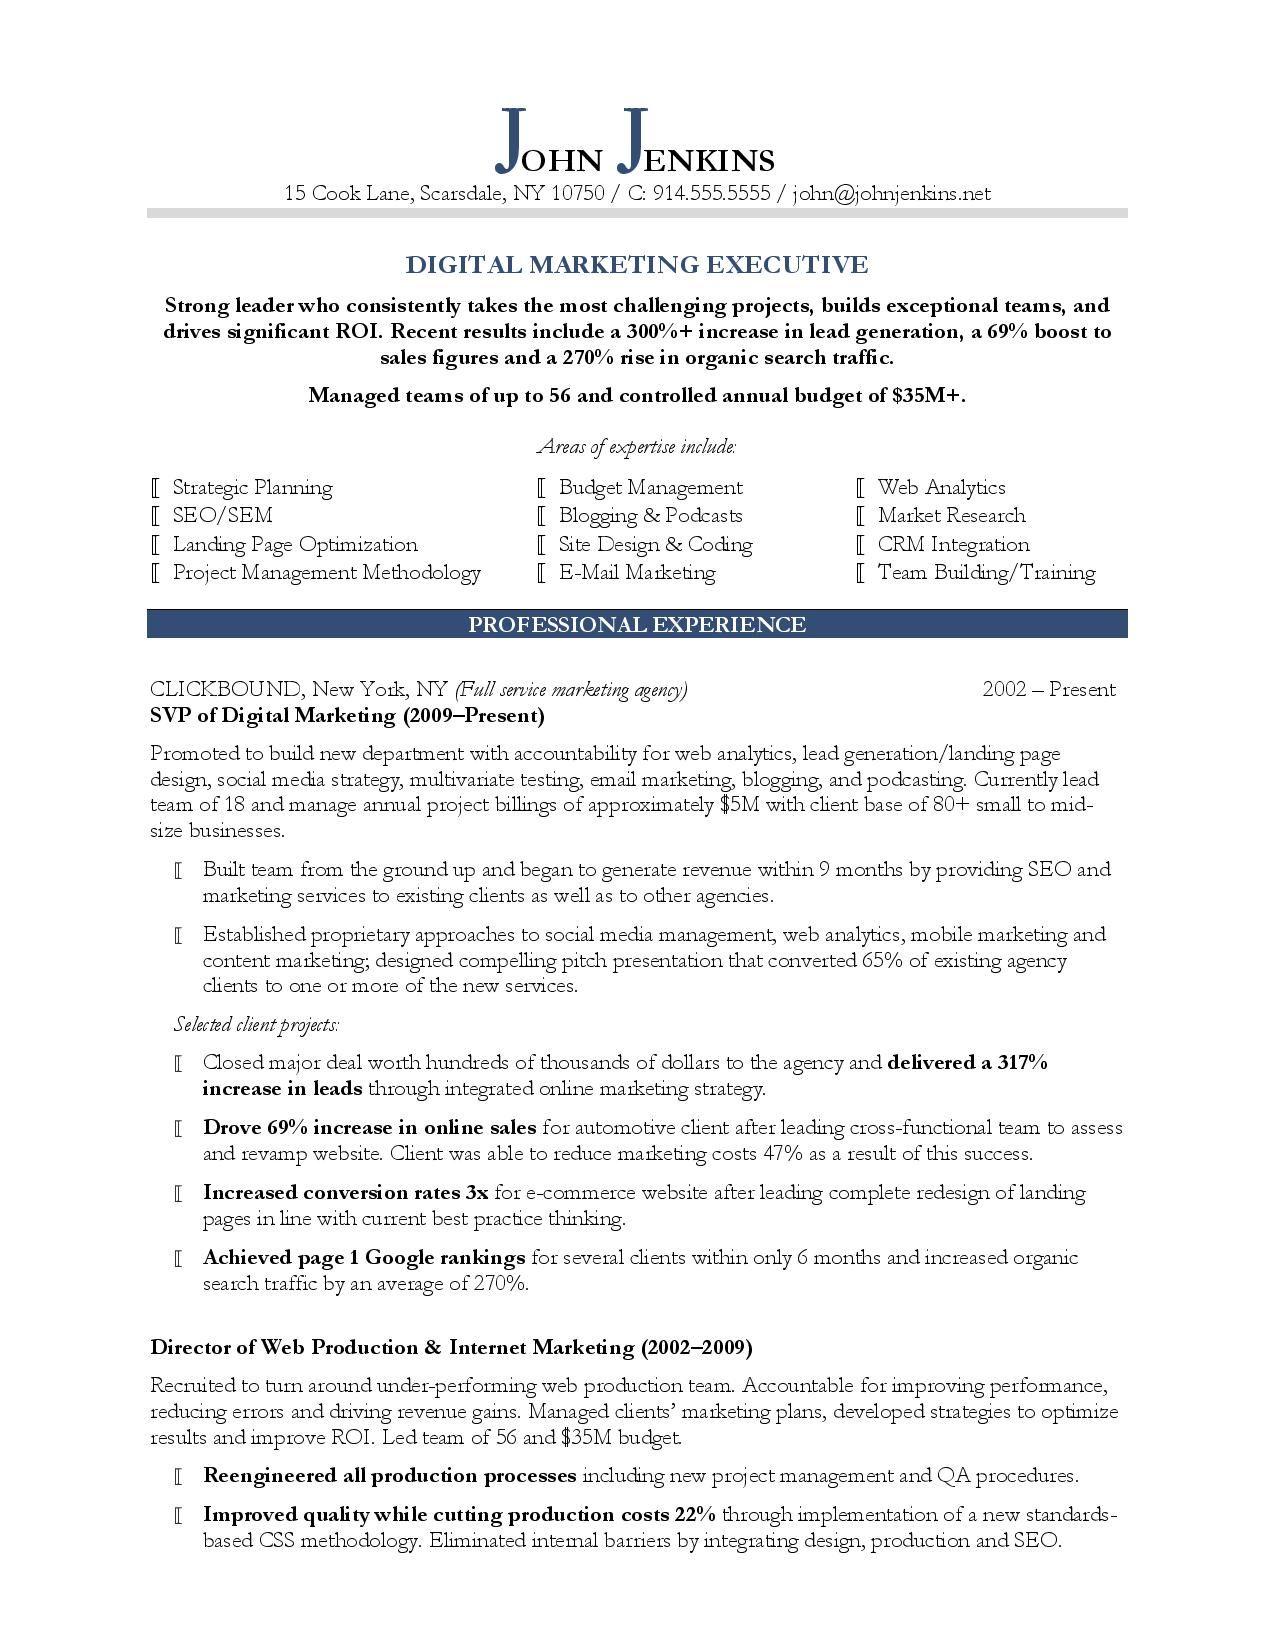 Marketing resume writing services